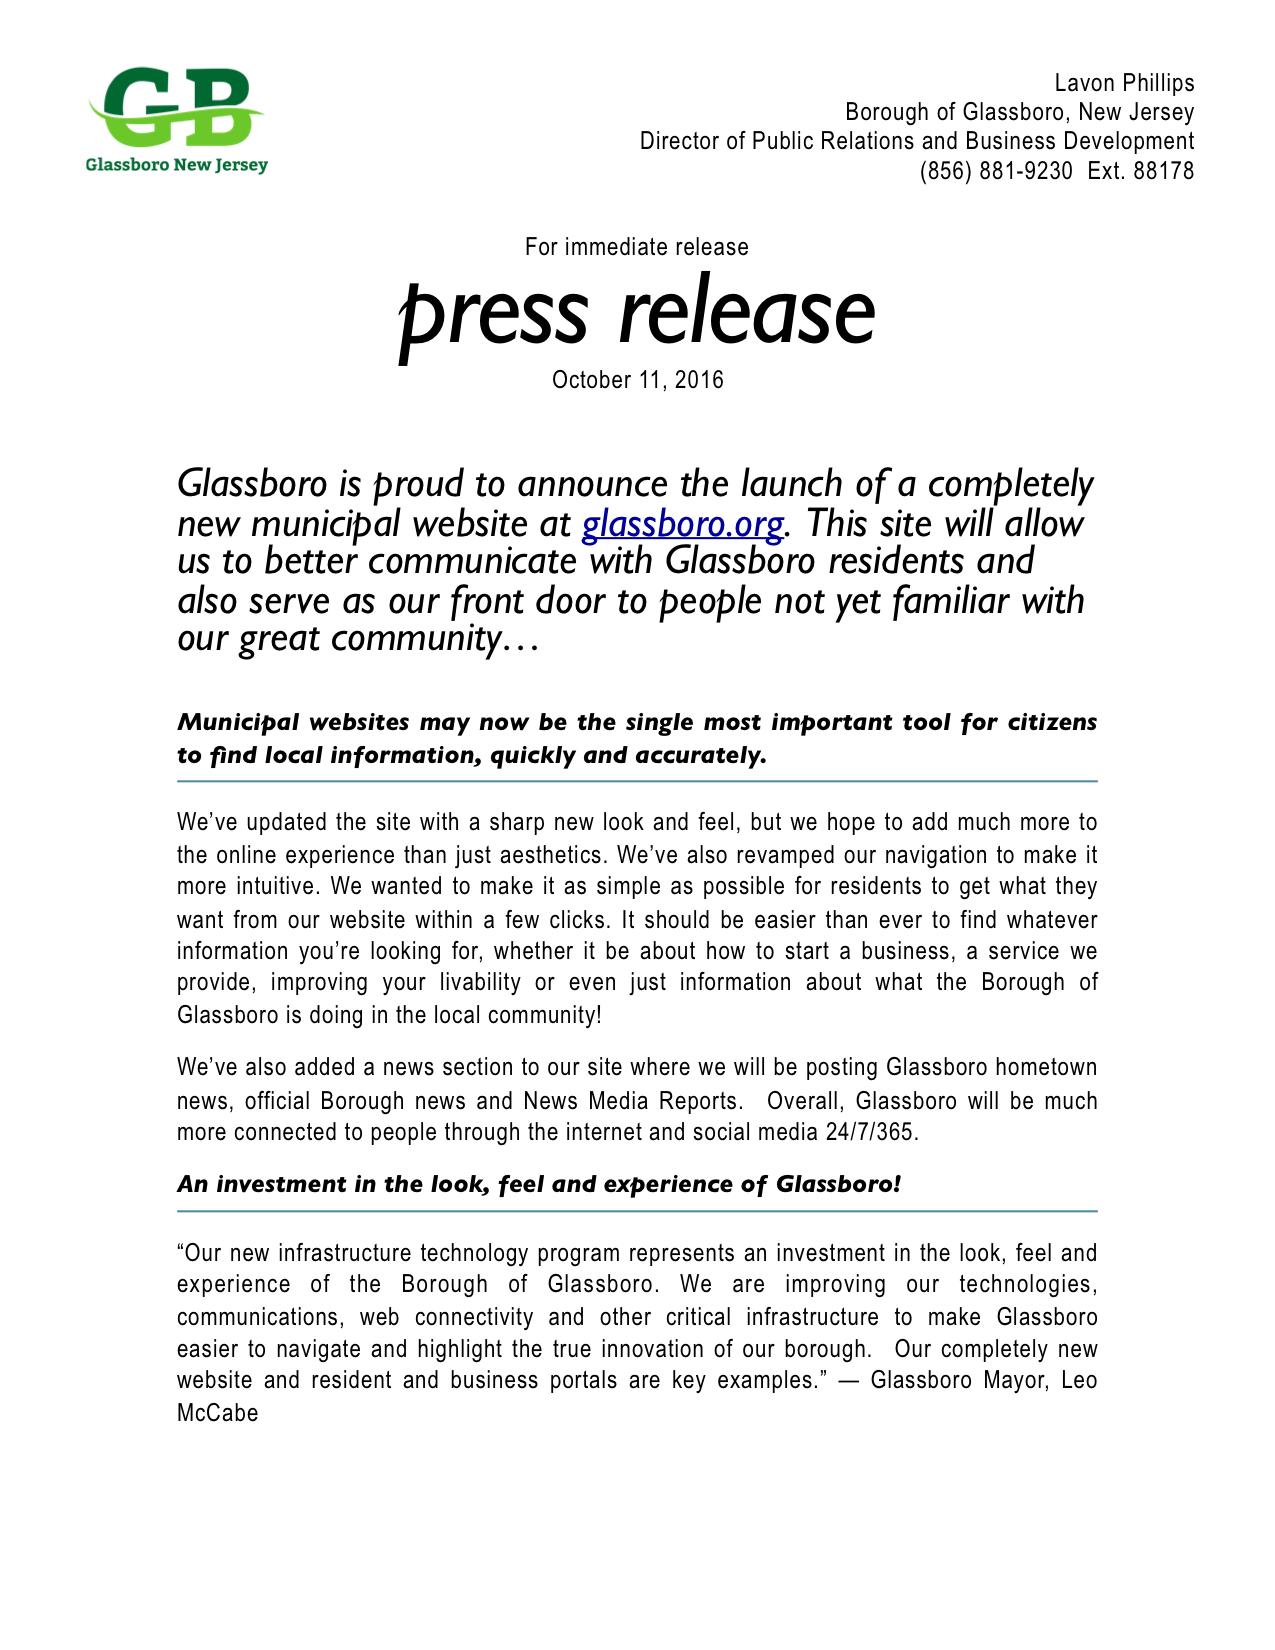 glassboro new website press release